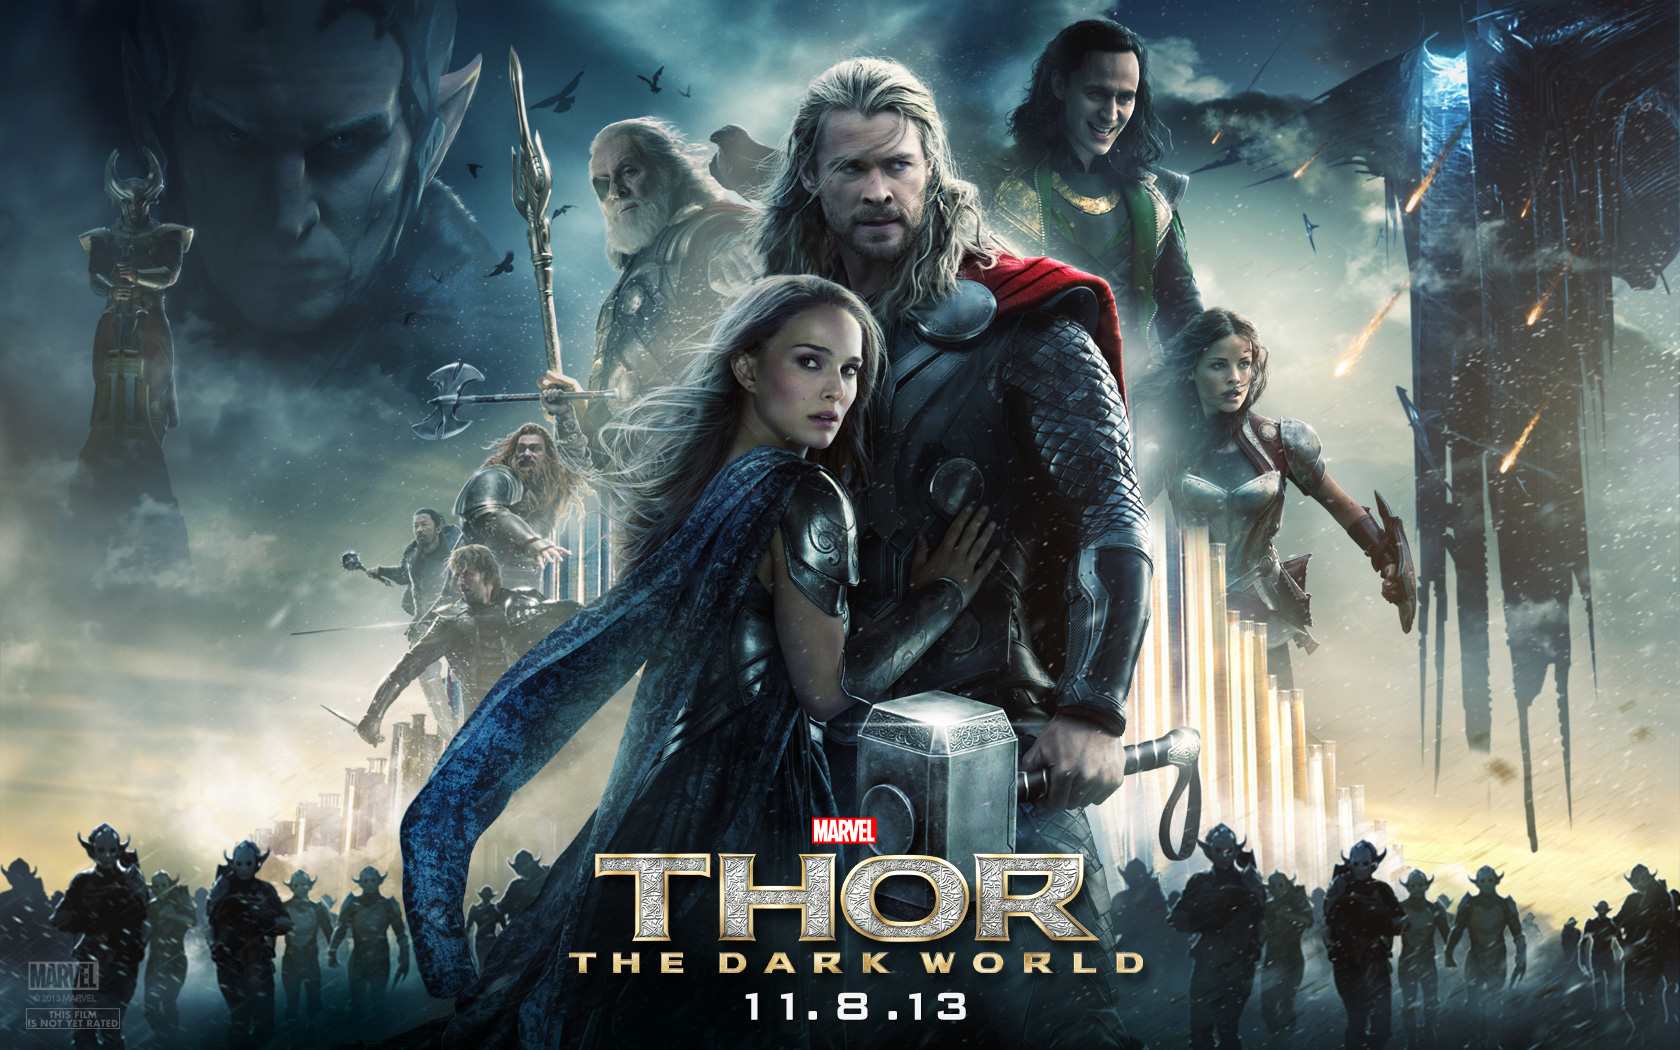 Watch Thor The Dark World Online Full Movie Streaming